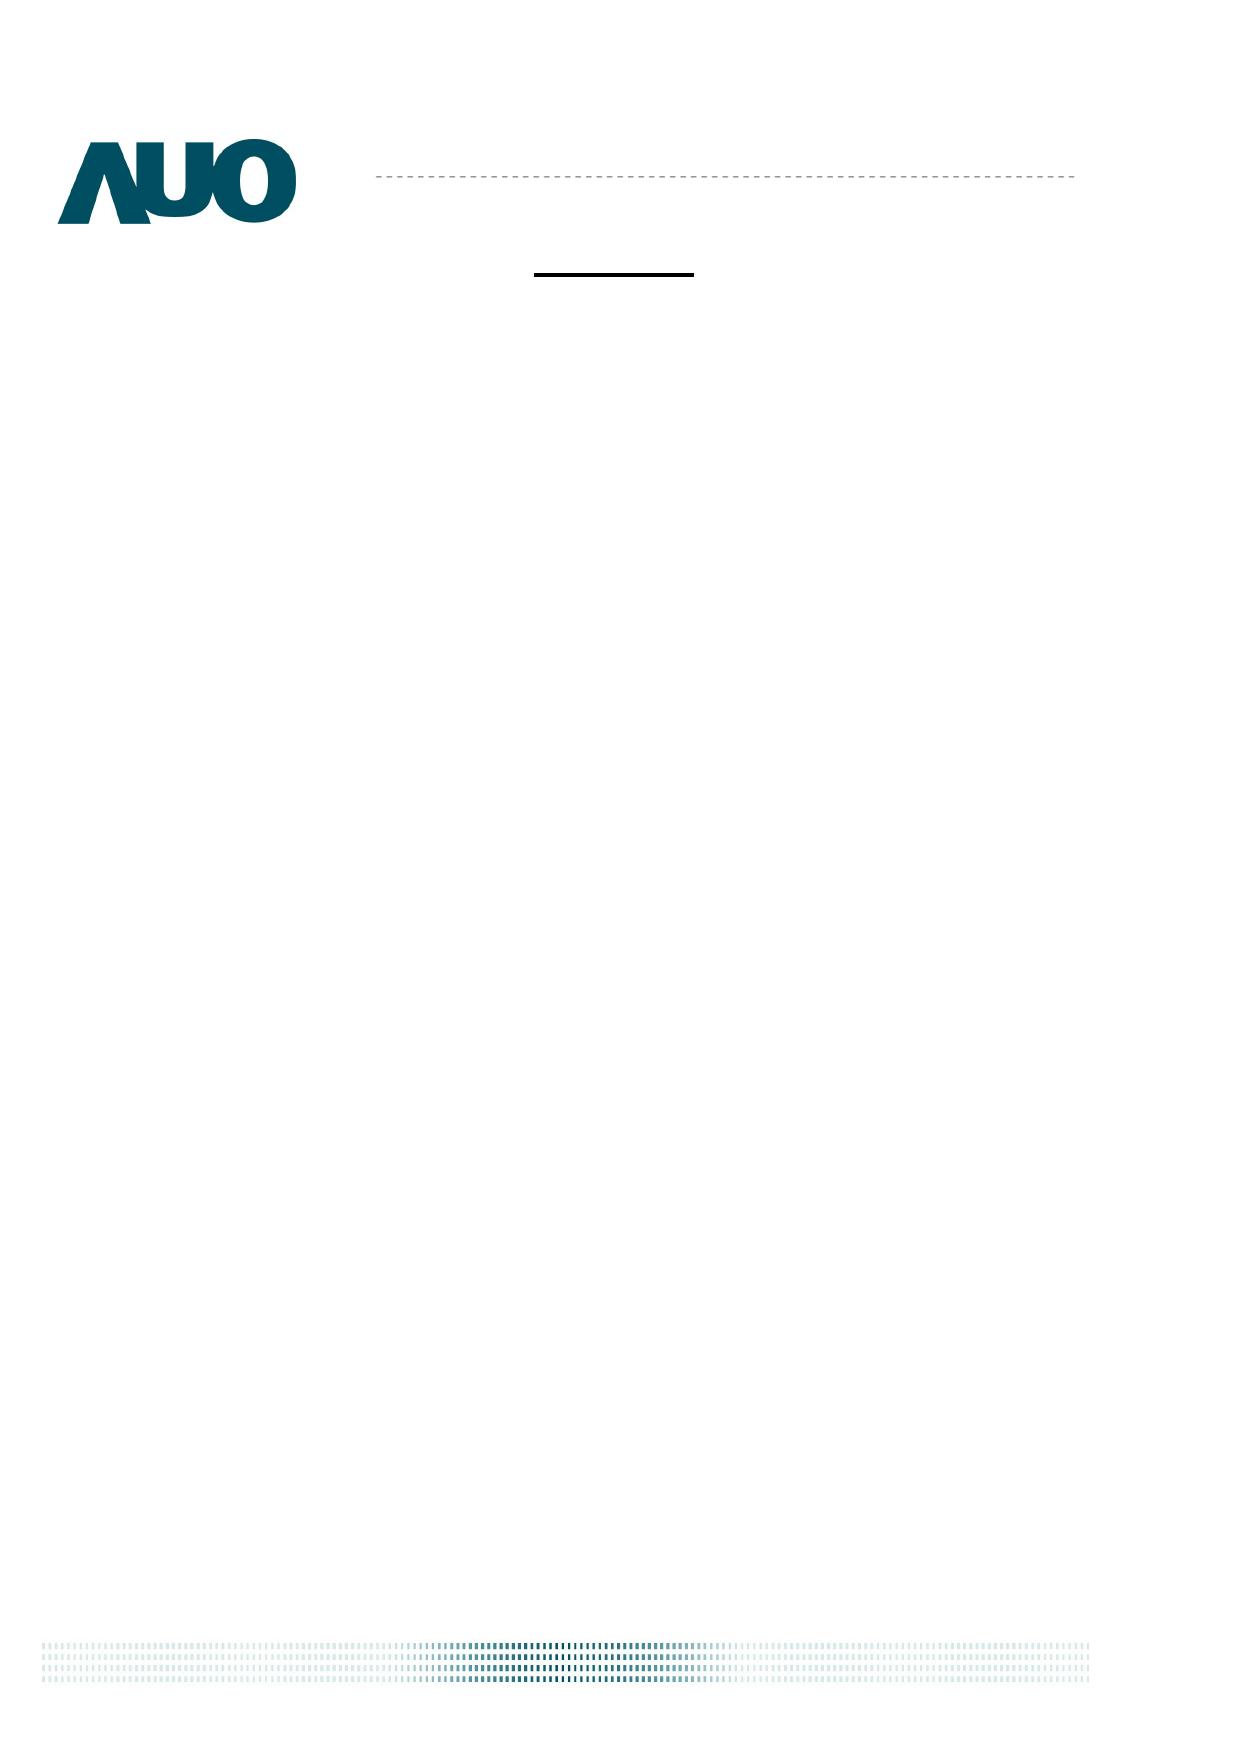 G070VVN01.0 Даташит, Описание, Даташиты